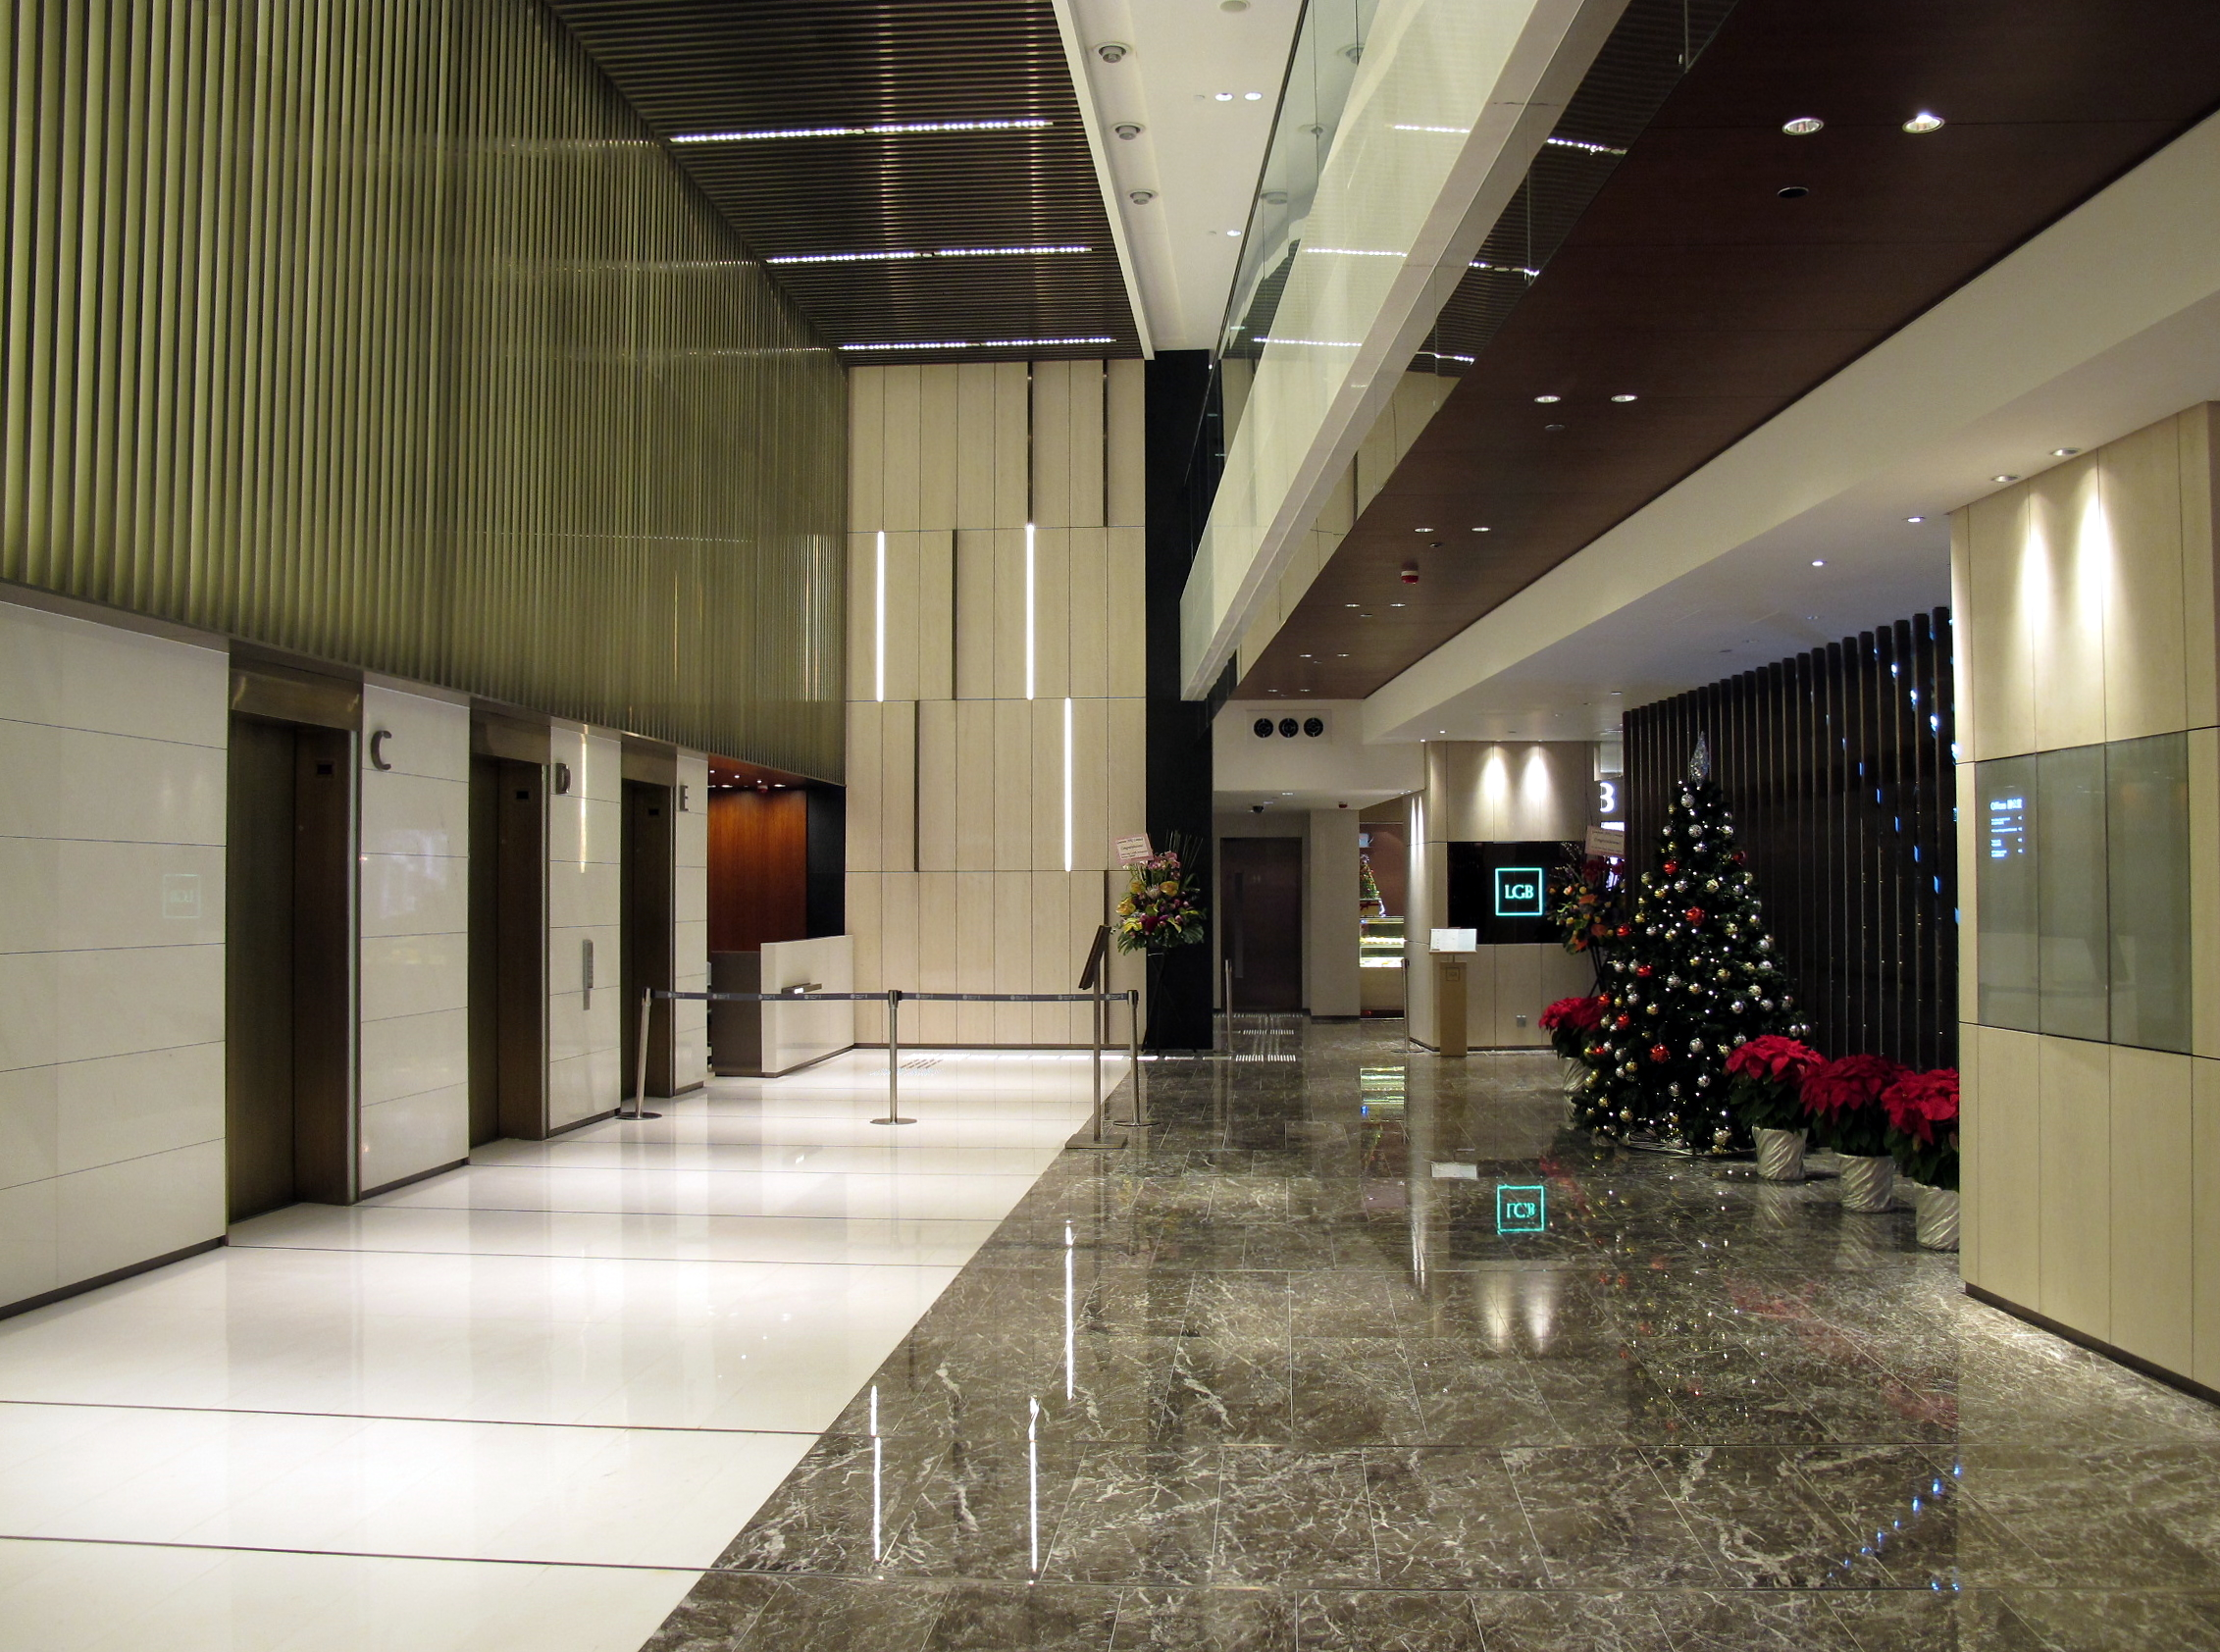 Ifc 1 Floor Plan Daum Accommodation Presidential Suite